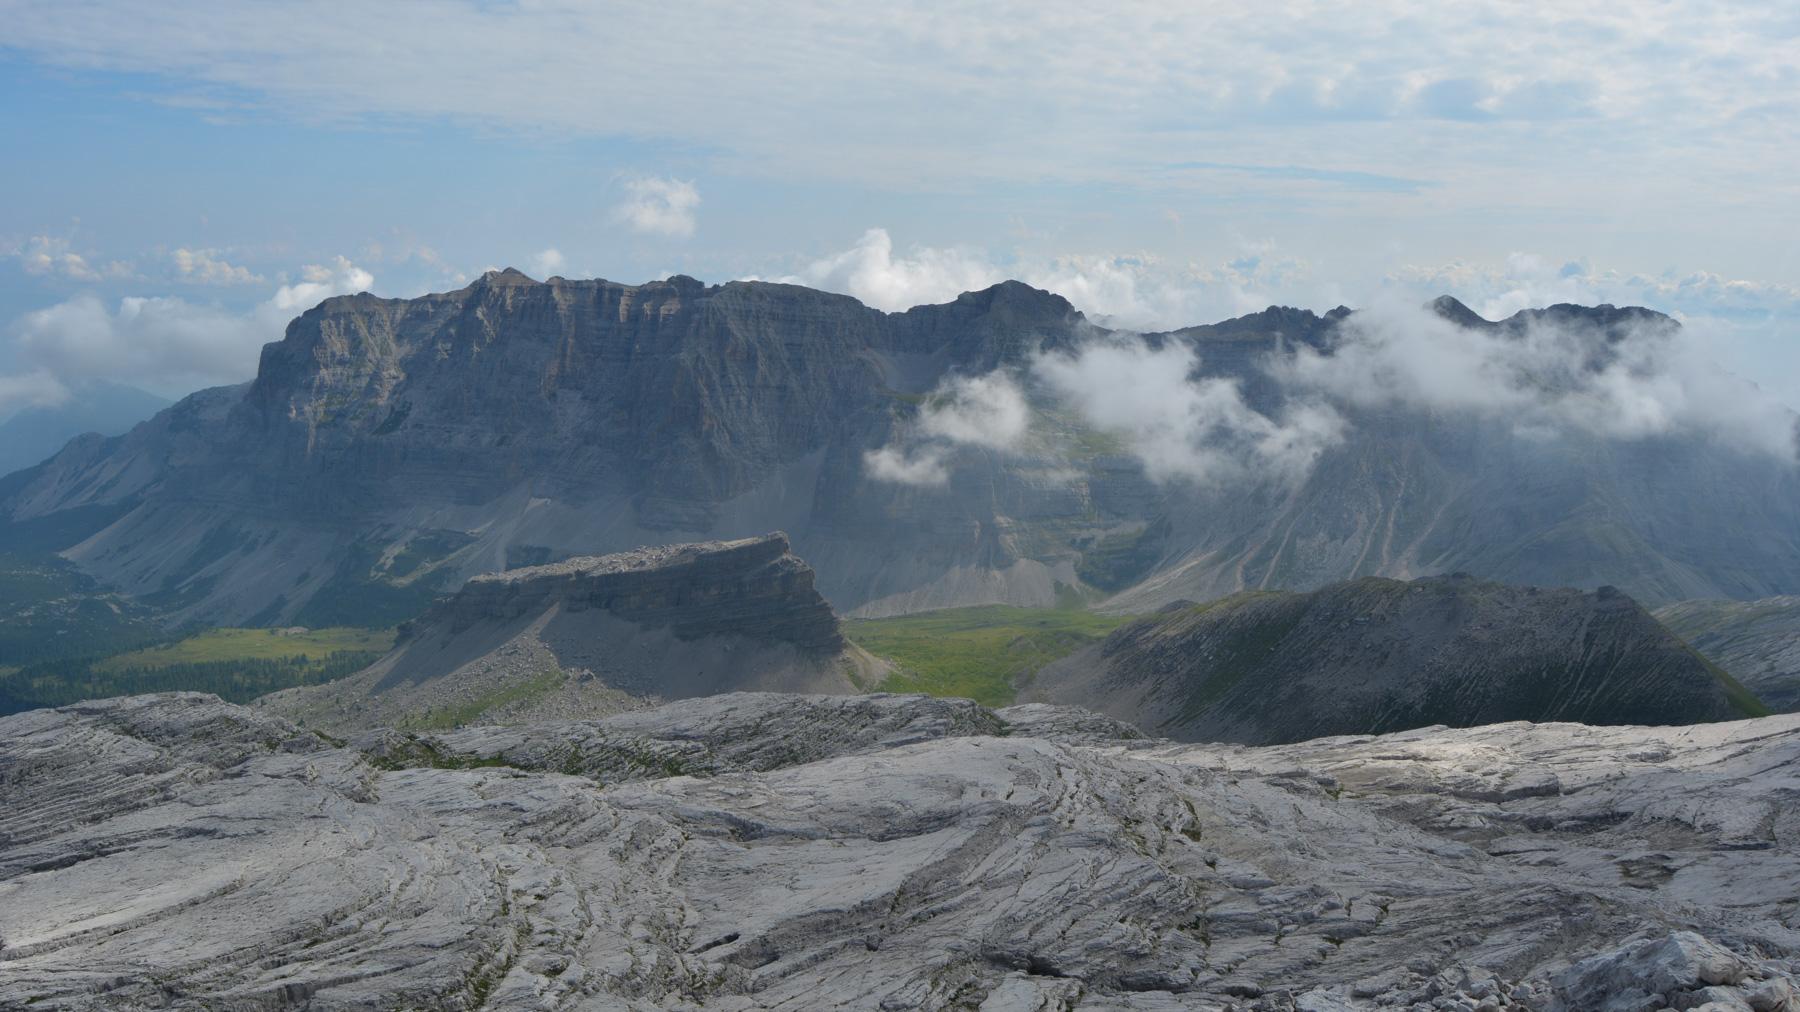 Sentiero Benini, Dolomites 14